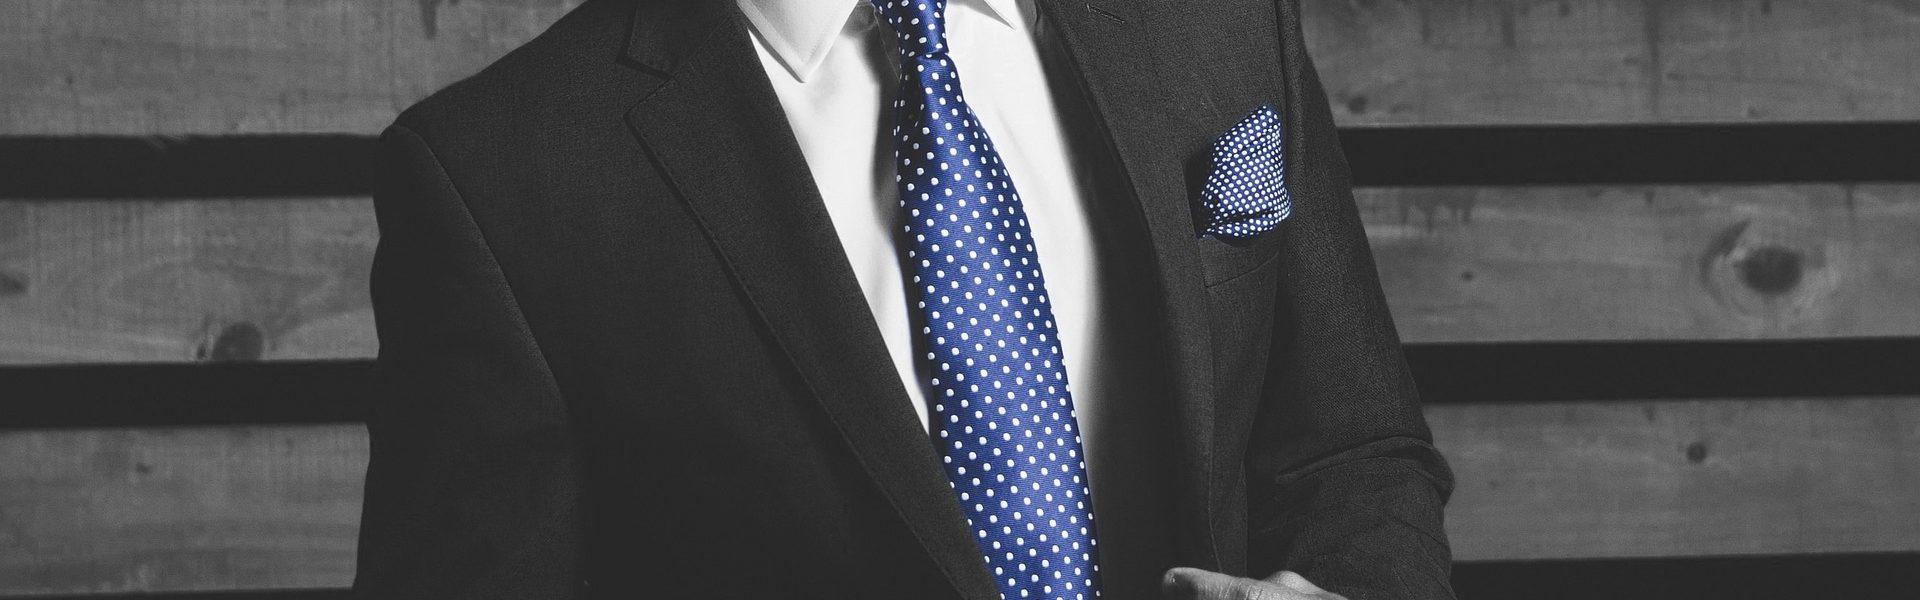 businessman-4785283_1920